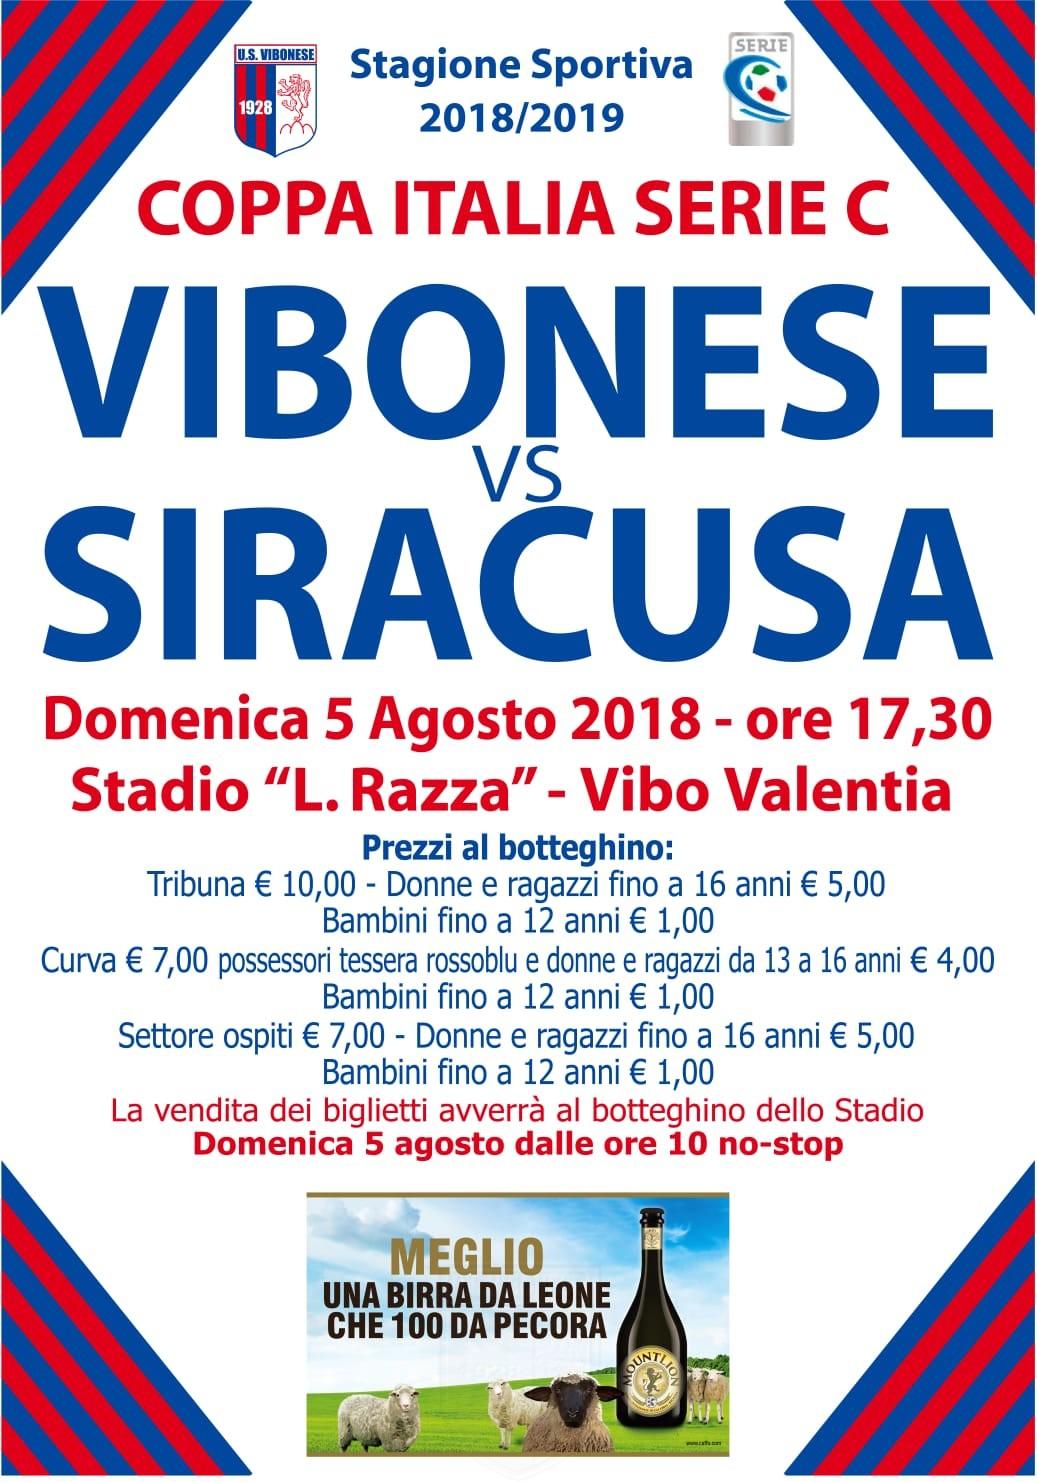 Vibonese - Siracusa: La storia dice... immagine 8484 US Vibonese Calcio